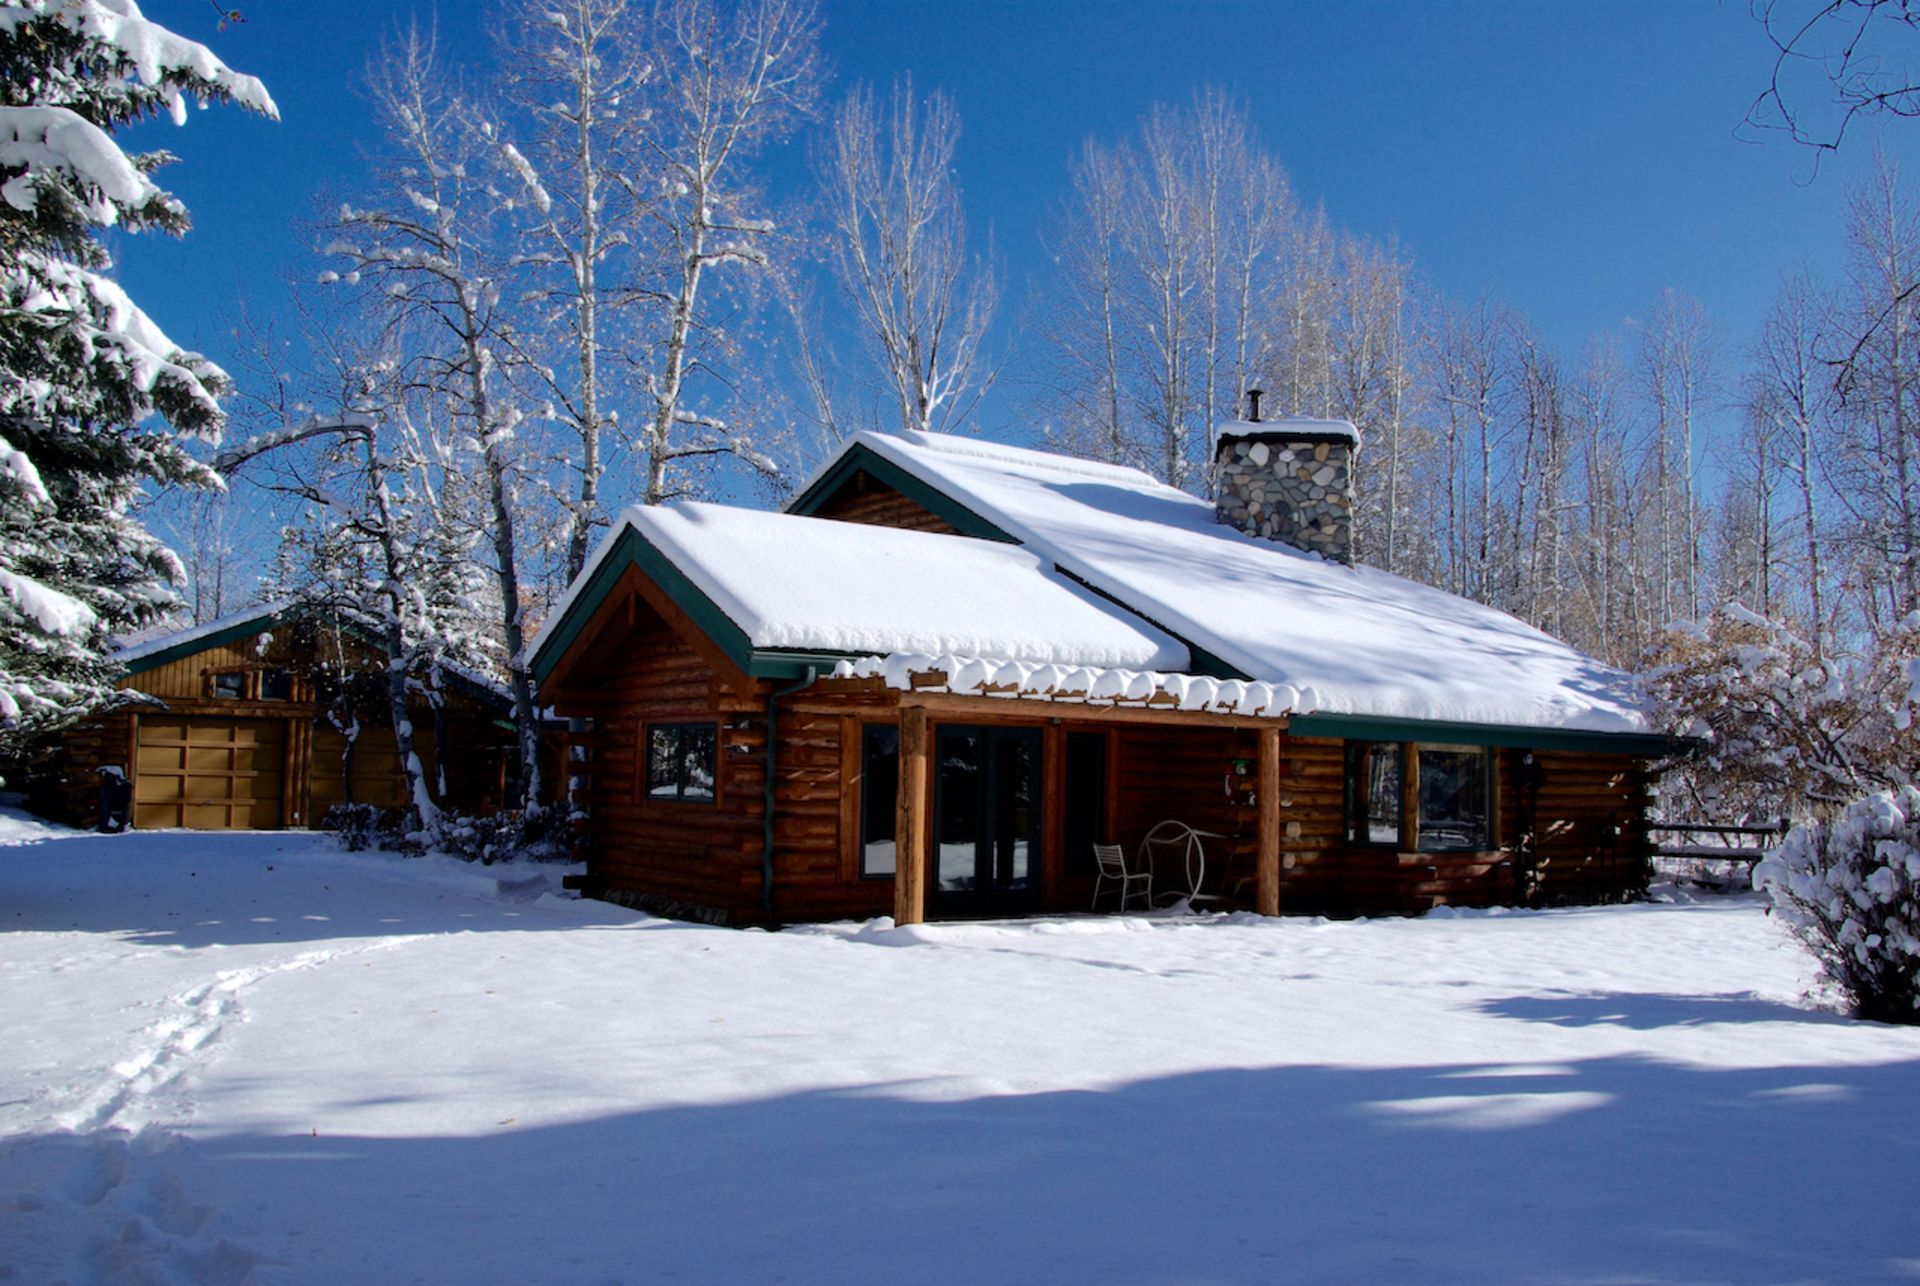 Charming Log Home, Close to Big Wood River!